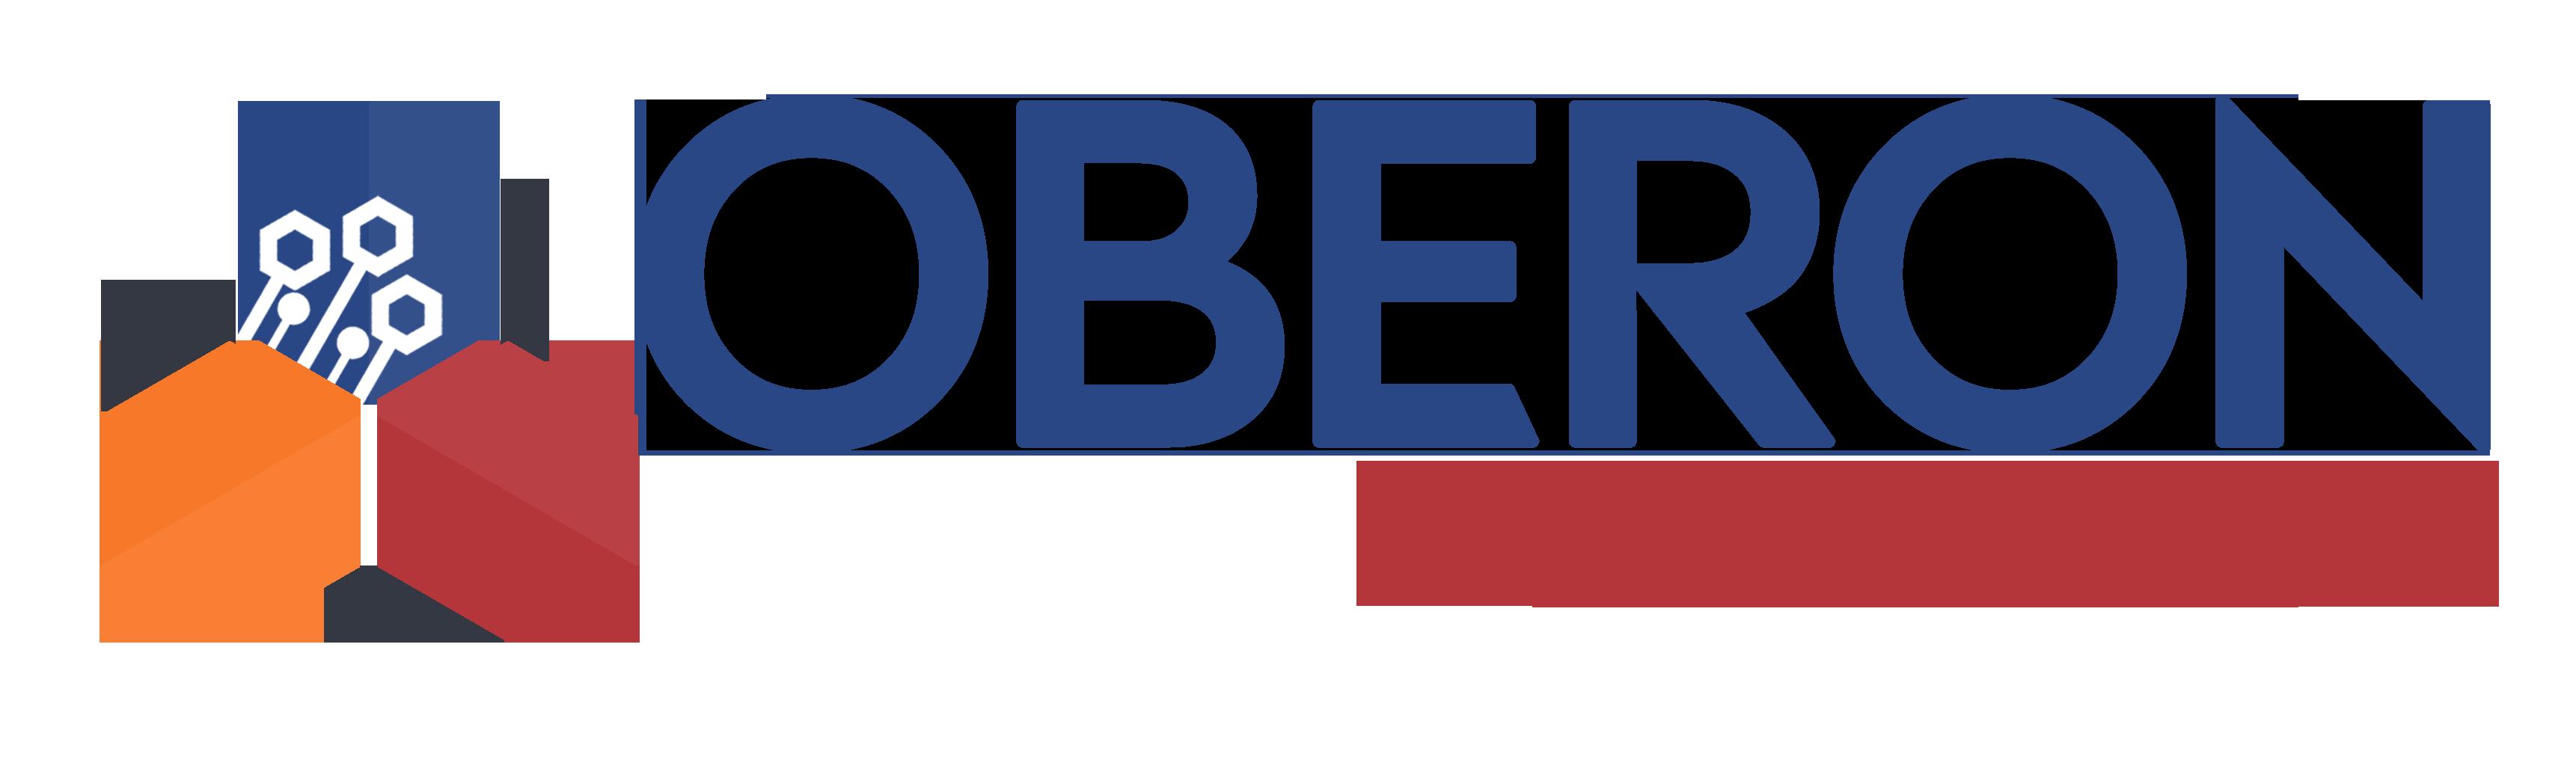 Oberon Americas | Next Generation Fleet & Supplies Management Solution